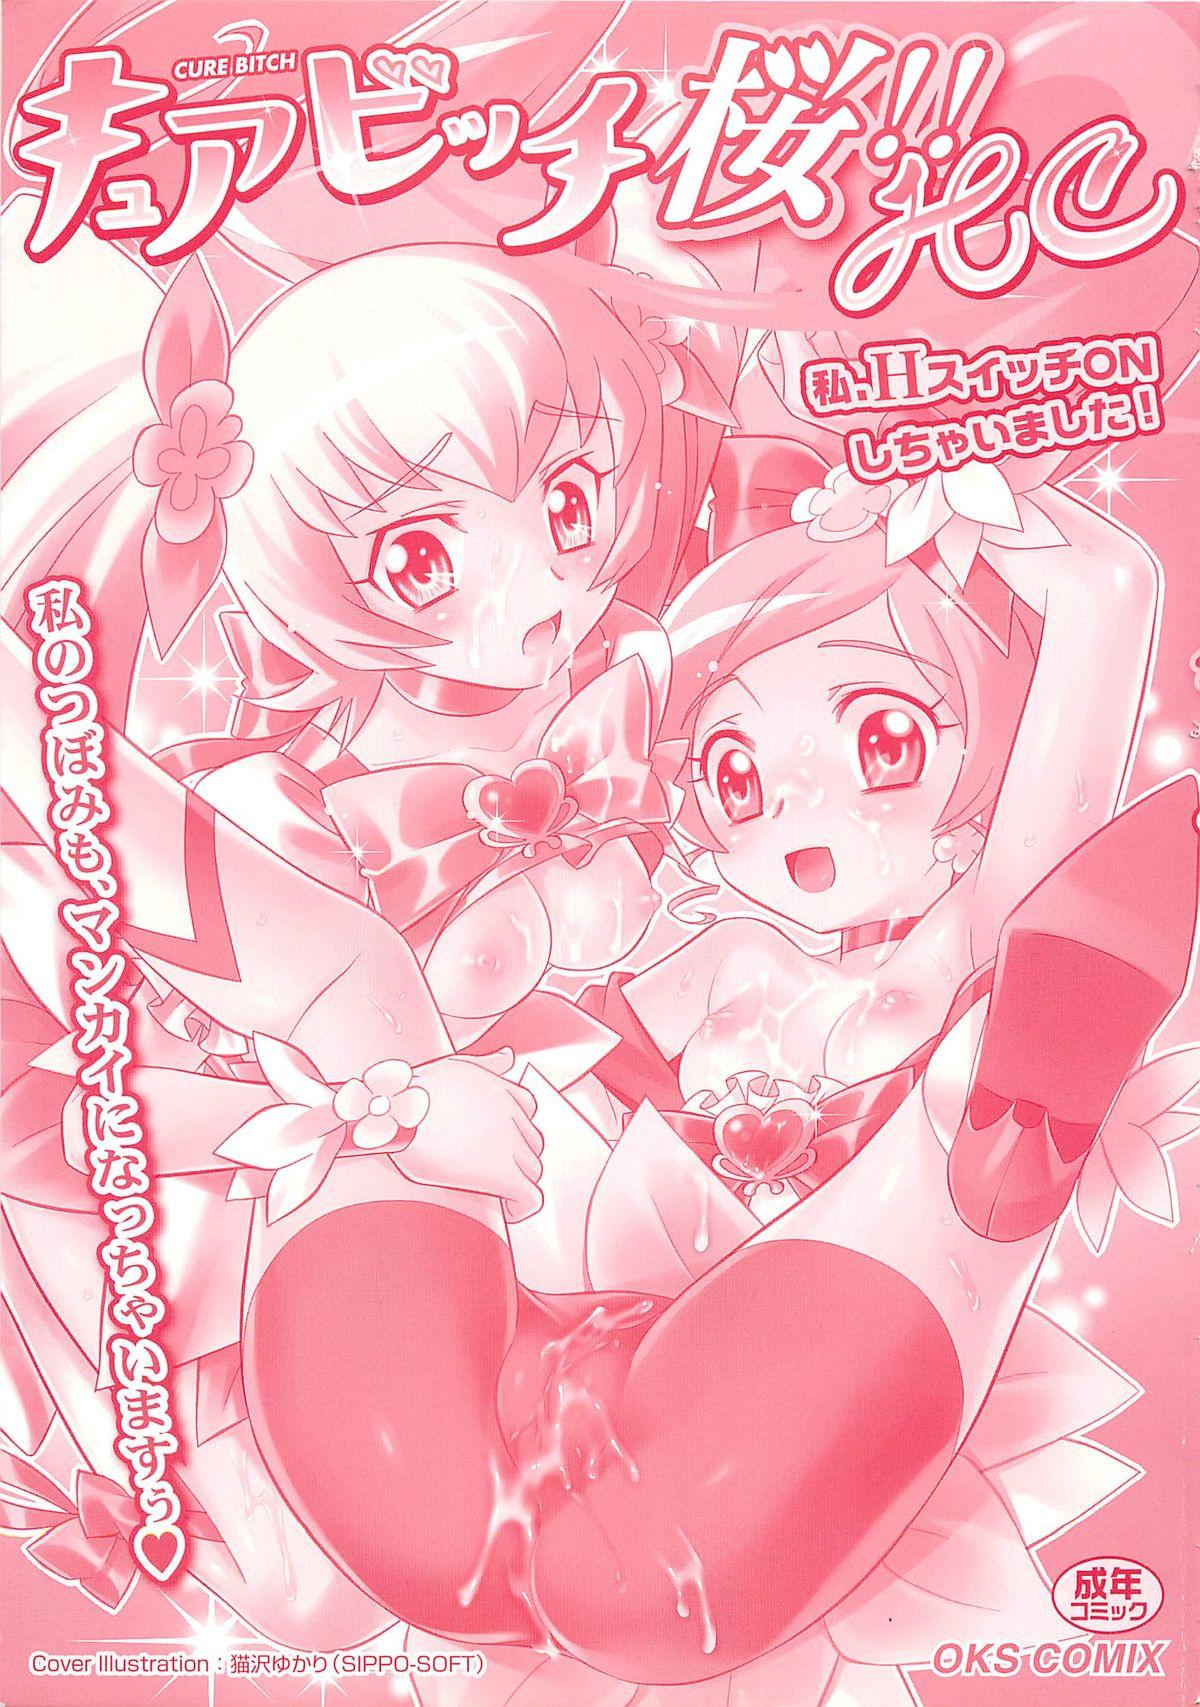 Cure Bitch Sakura!! HC 2